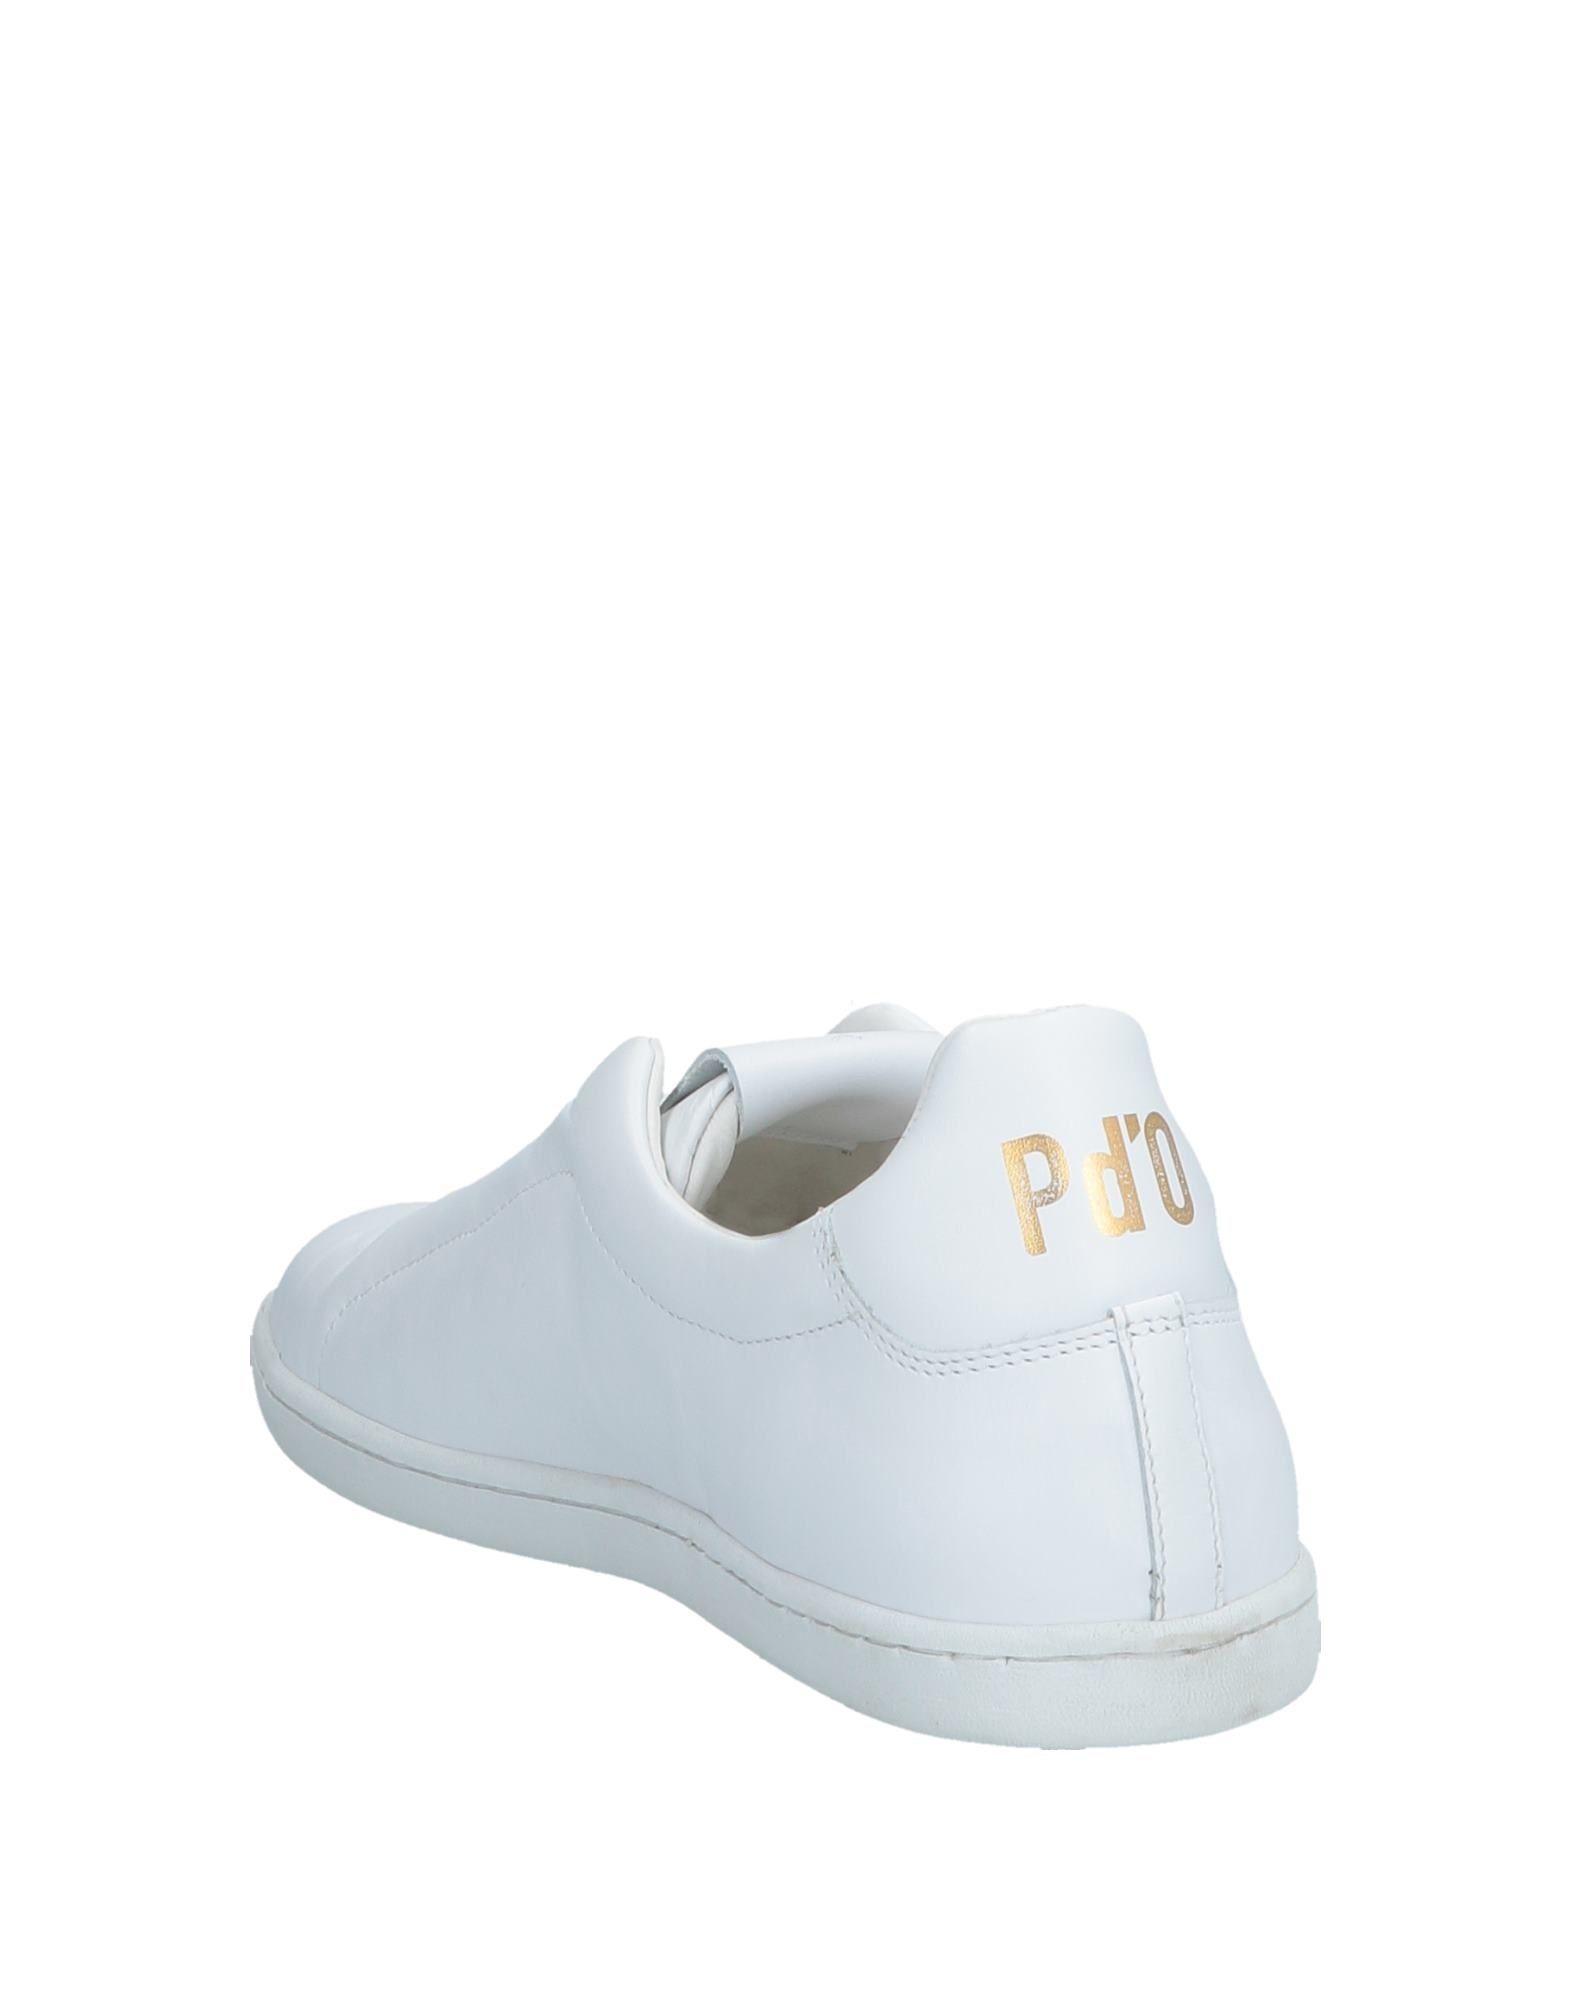 Pantofola D'oro Sneakers Herren  Schuhe 11569867JW Gute Qualität beliebte Schuhe  c44284